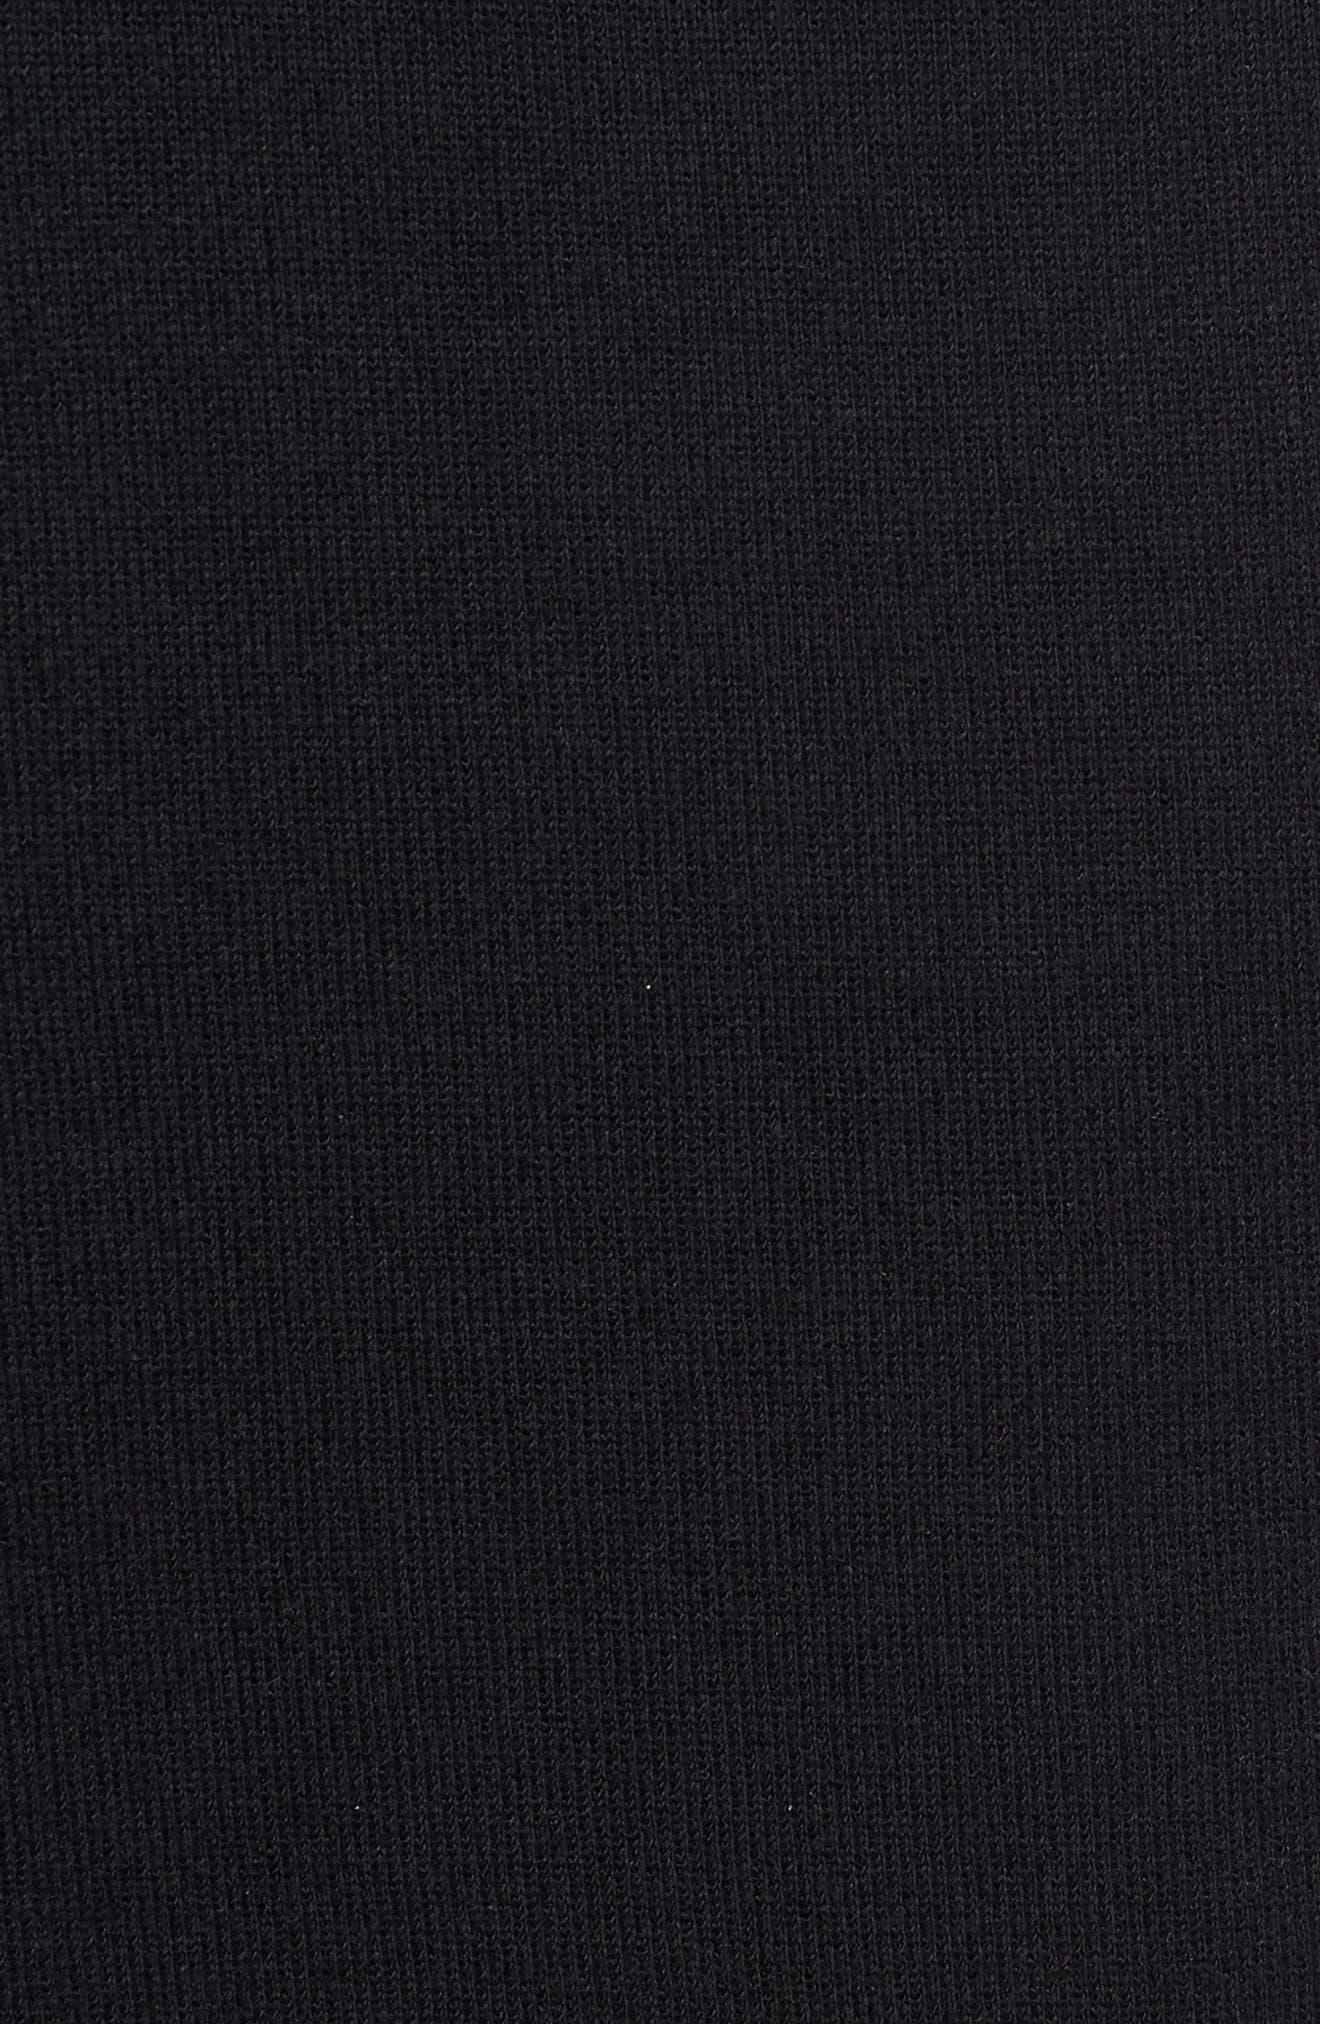 Chicago Bulls Courtside Snap Track Pants,                             Alternate thumbnail 5, color,                             BLACK/ BLACK